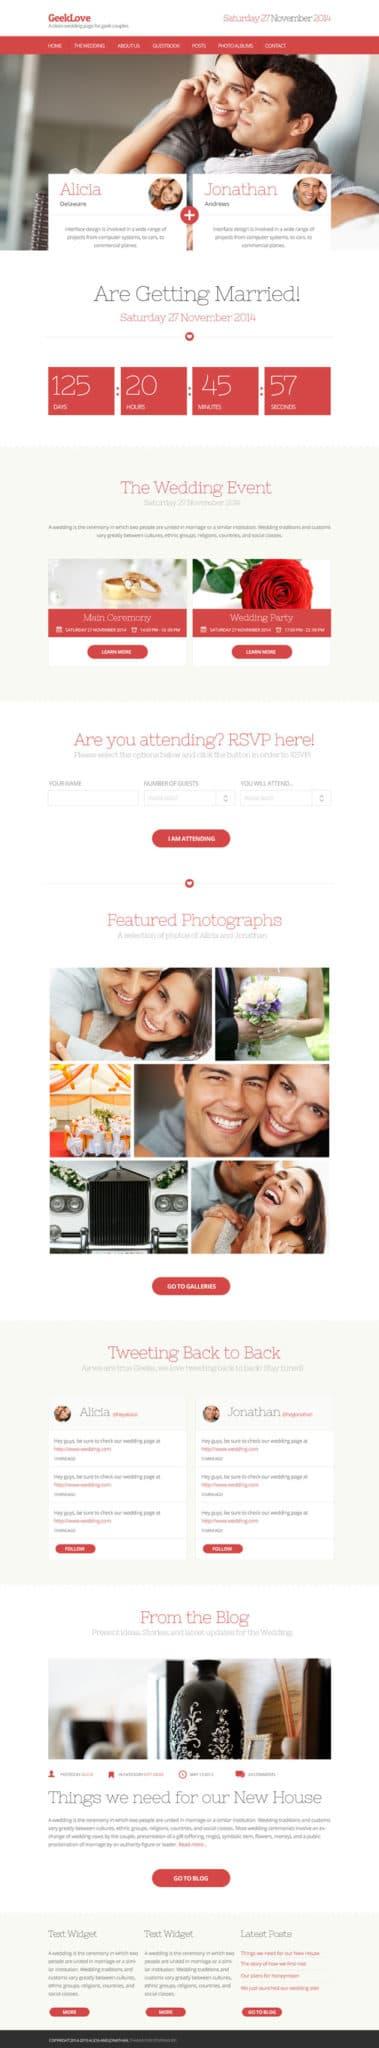 geeklove-responsive-wedding-theme